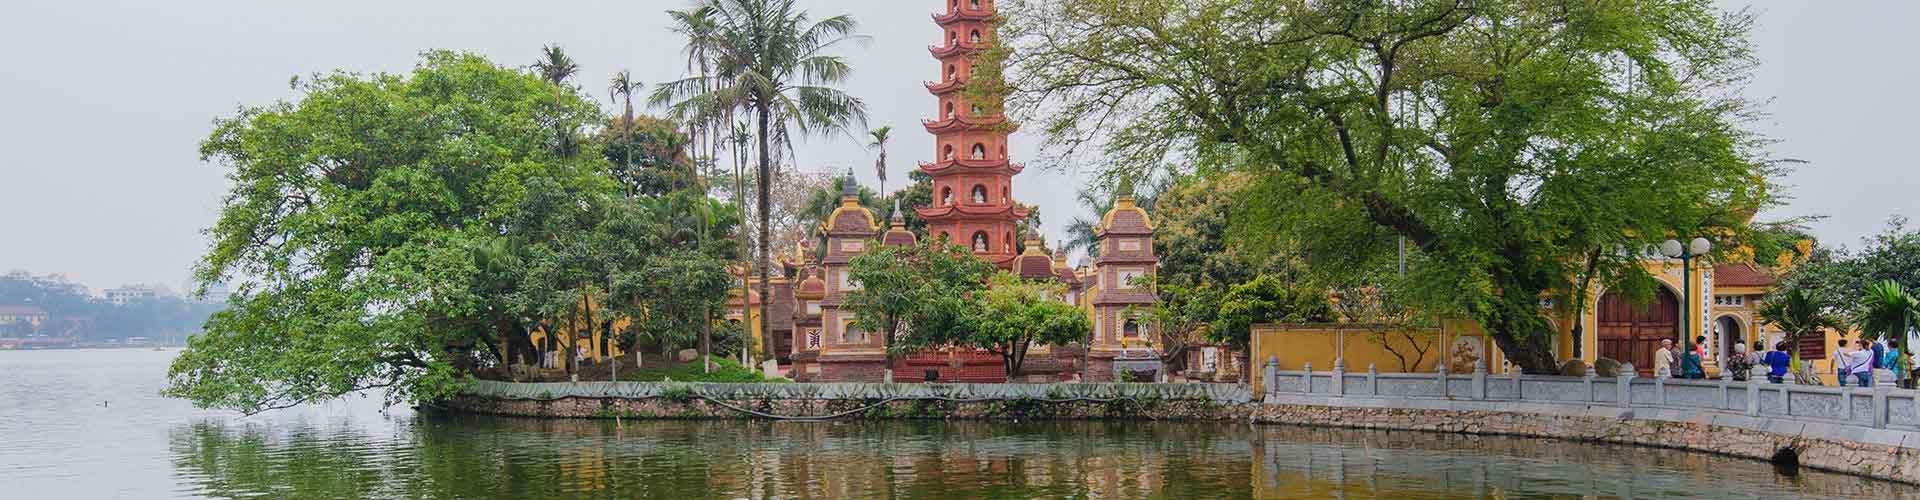 Hanoi – Ostelli a Hanoi. Mappe per Hanoi, Foto e  Recensioni per ogni Ostello a Hanoi.